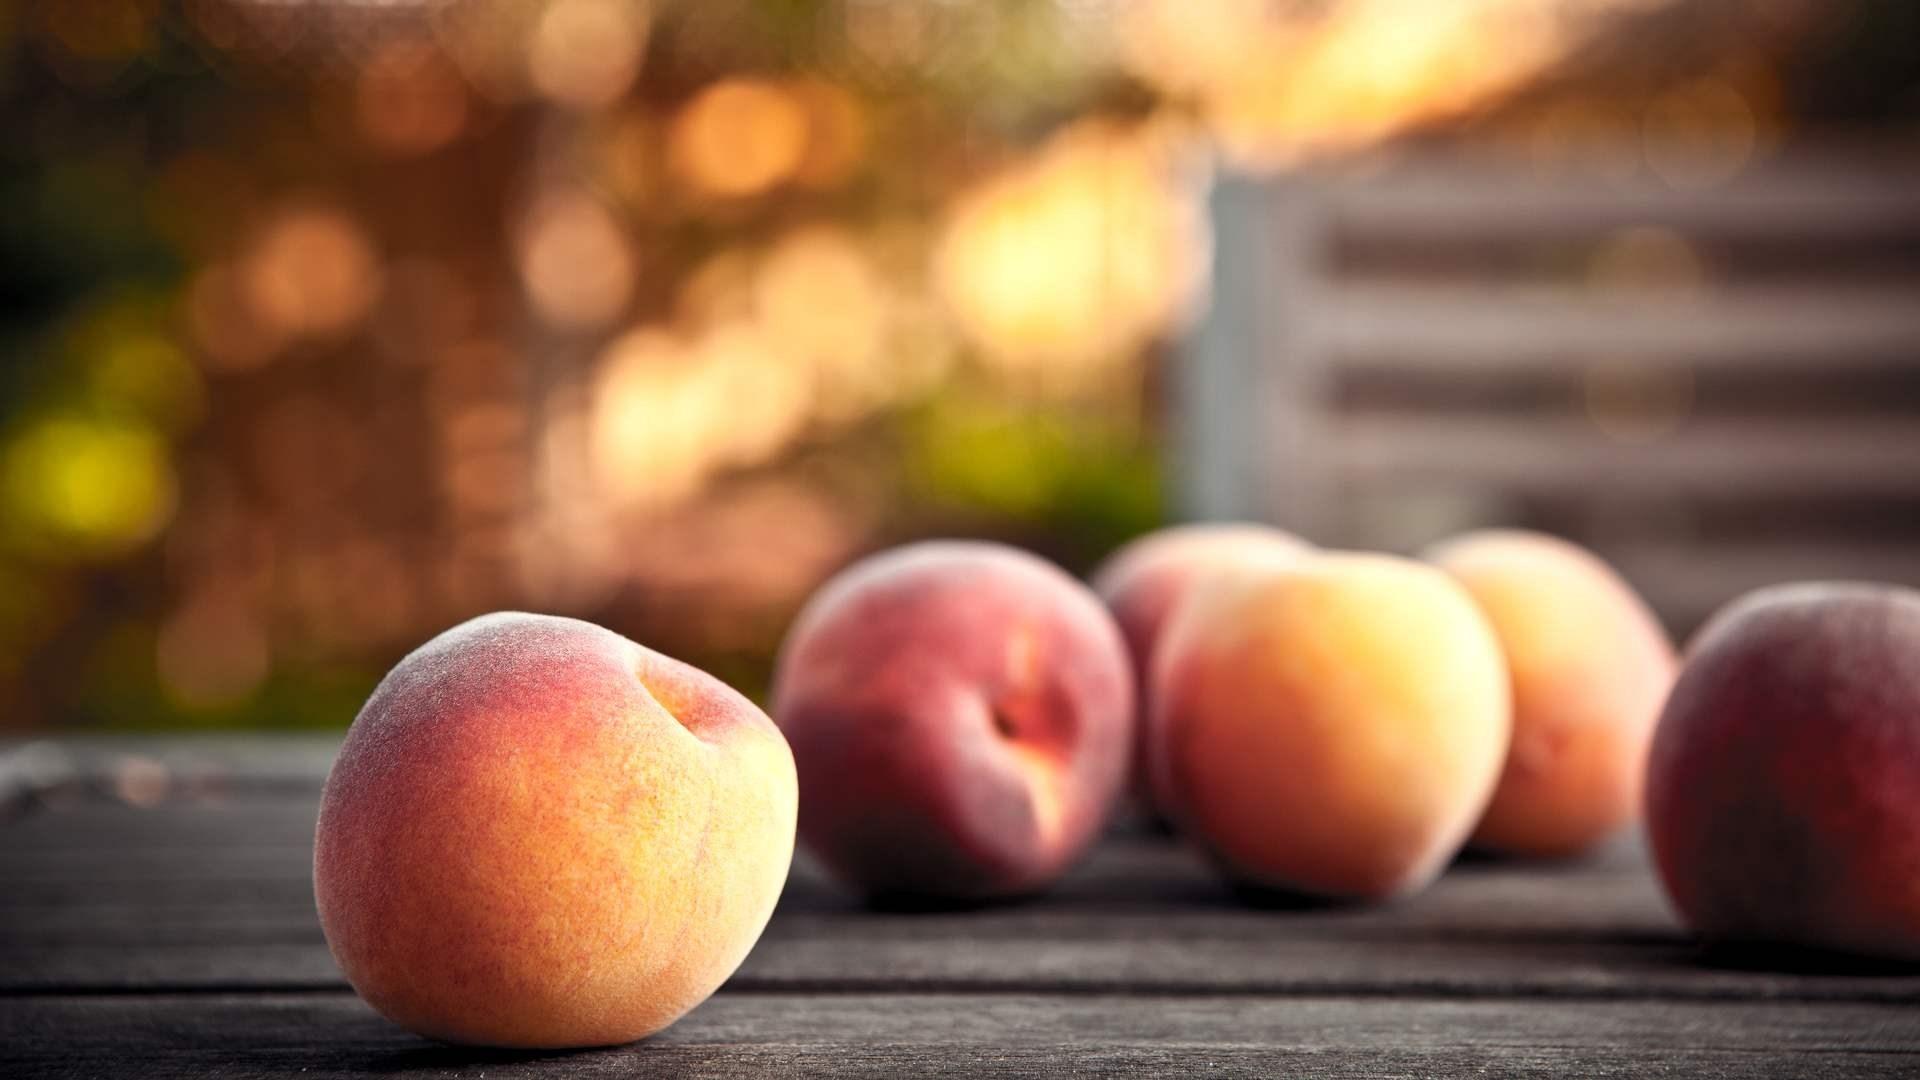 Peaches Fruit Hands Photo